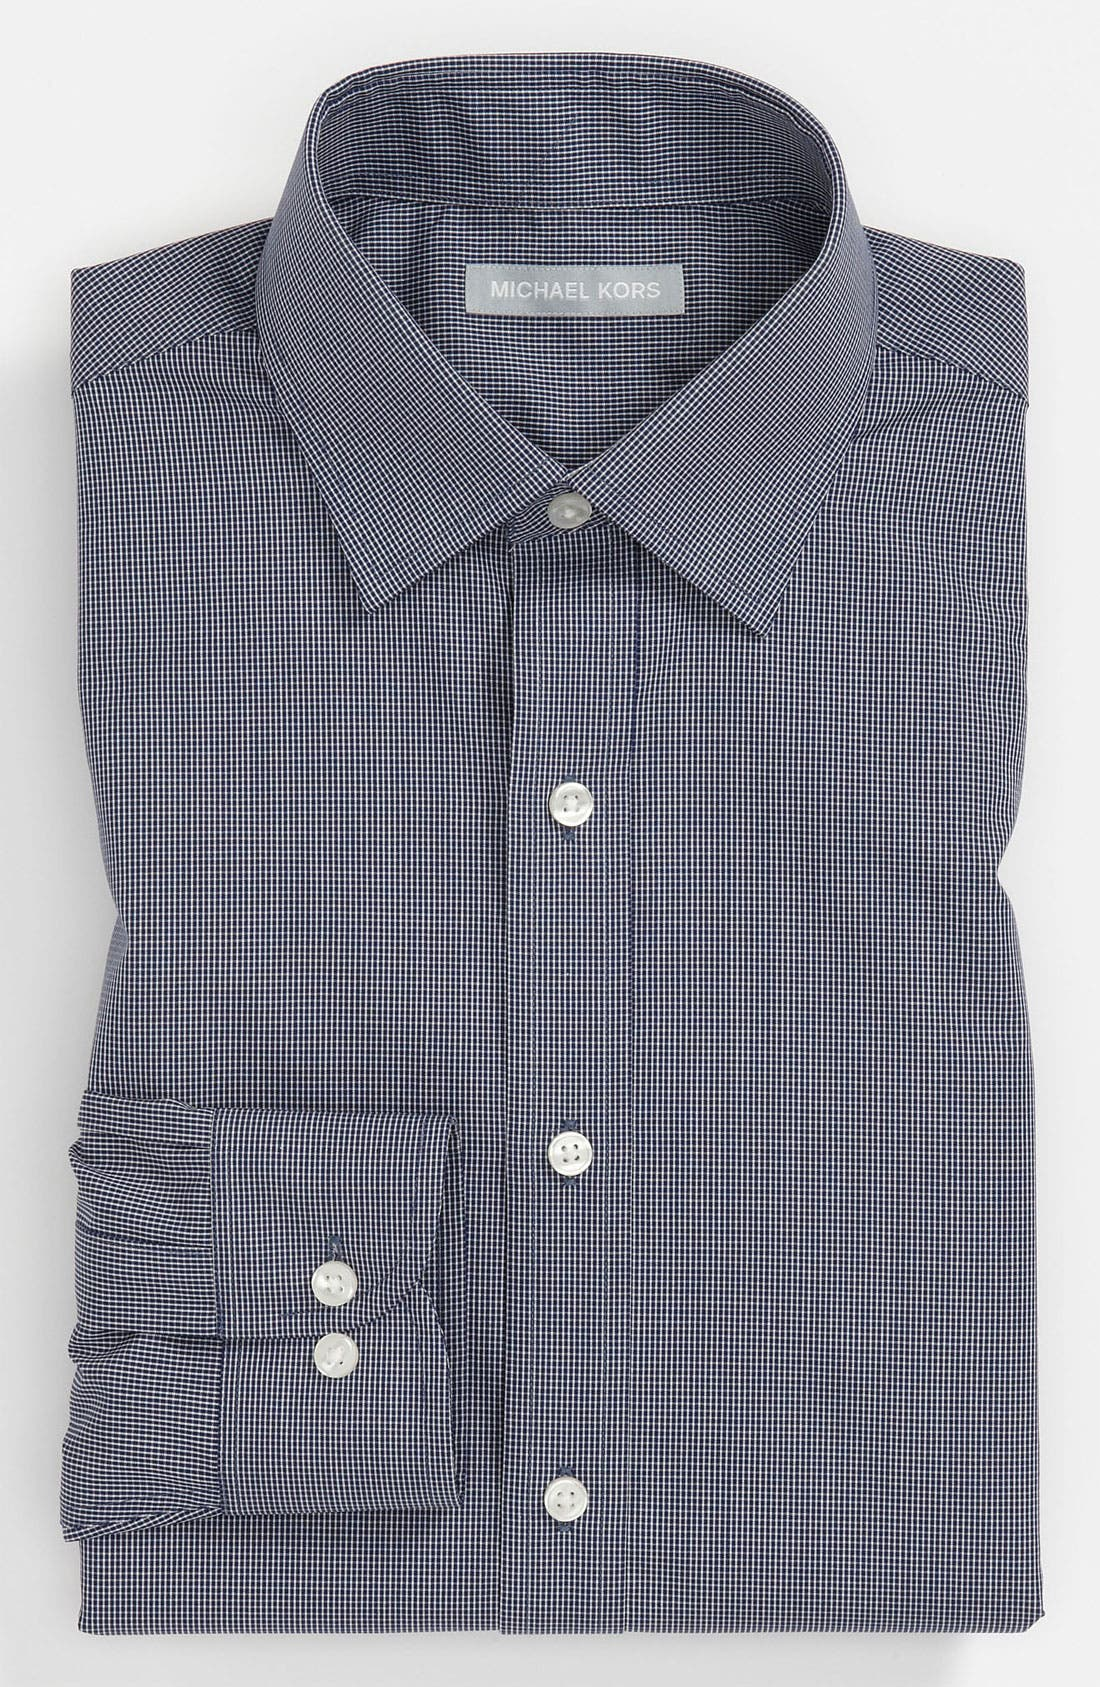 Alternate Image 1 Selected - Michael Kors Non-Iron Regular Fit Dress Shirt